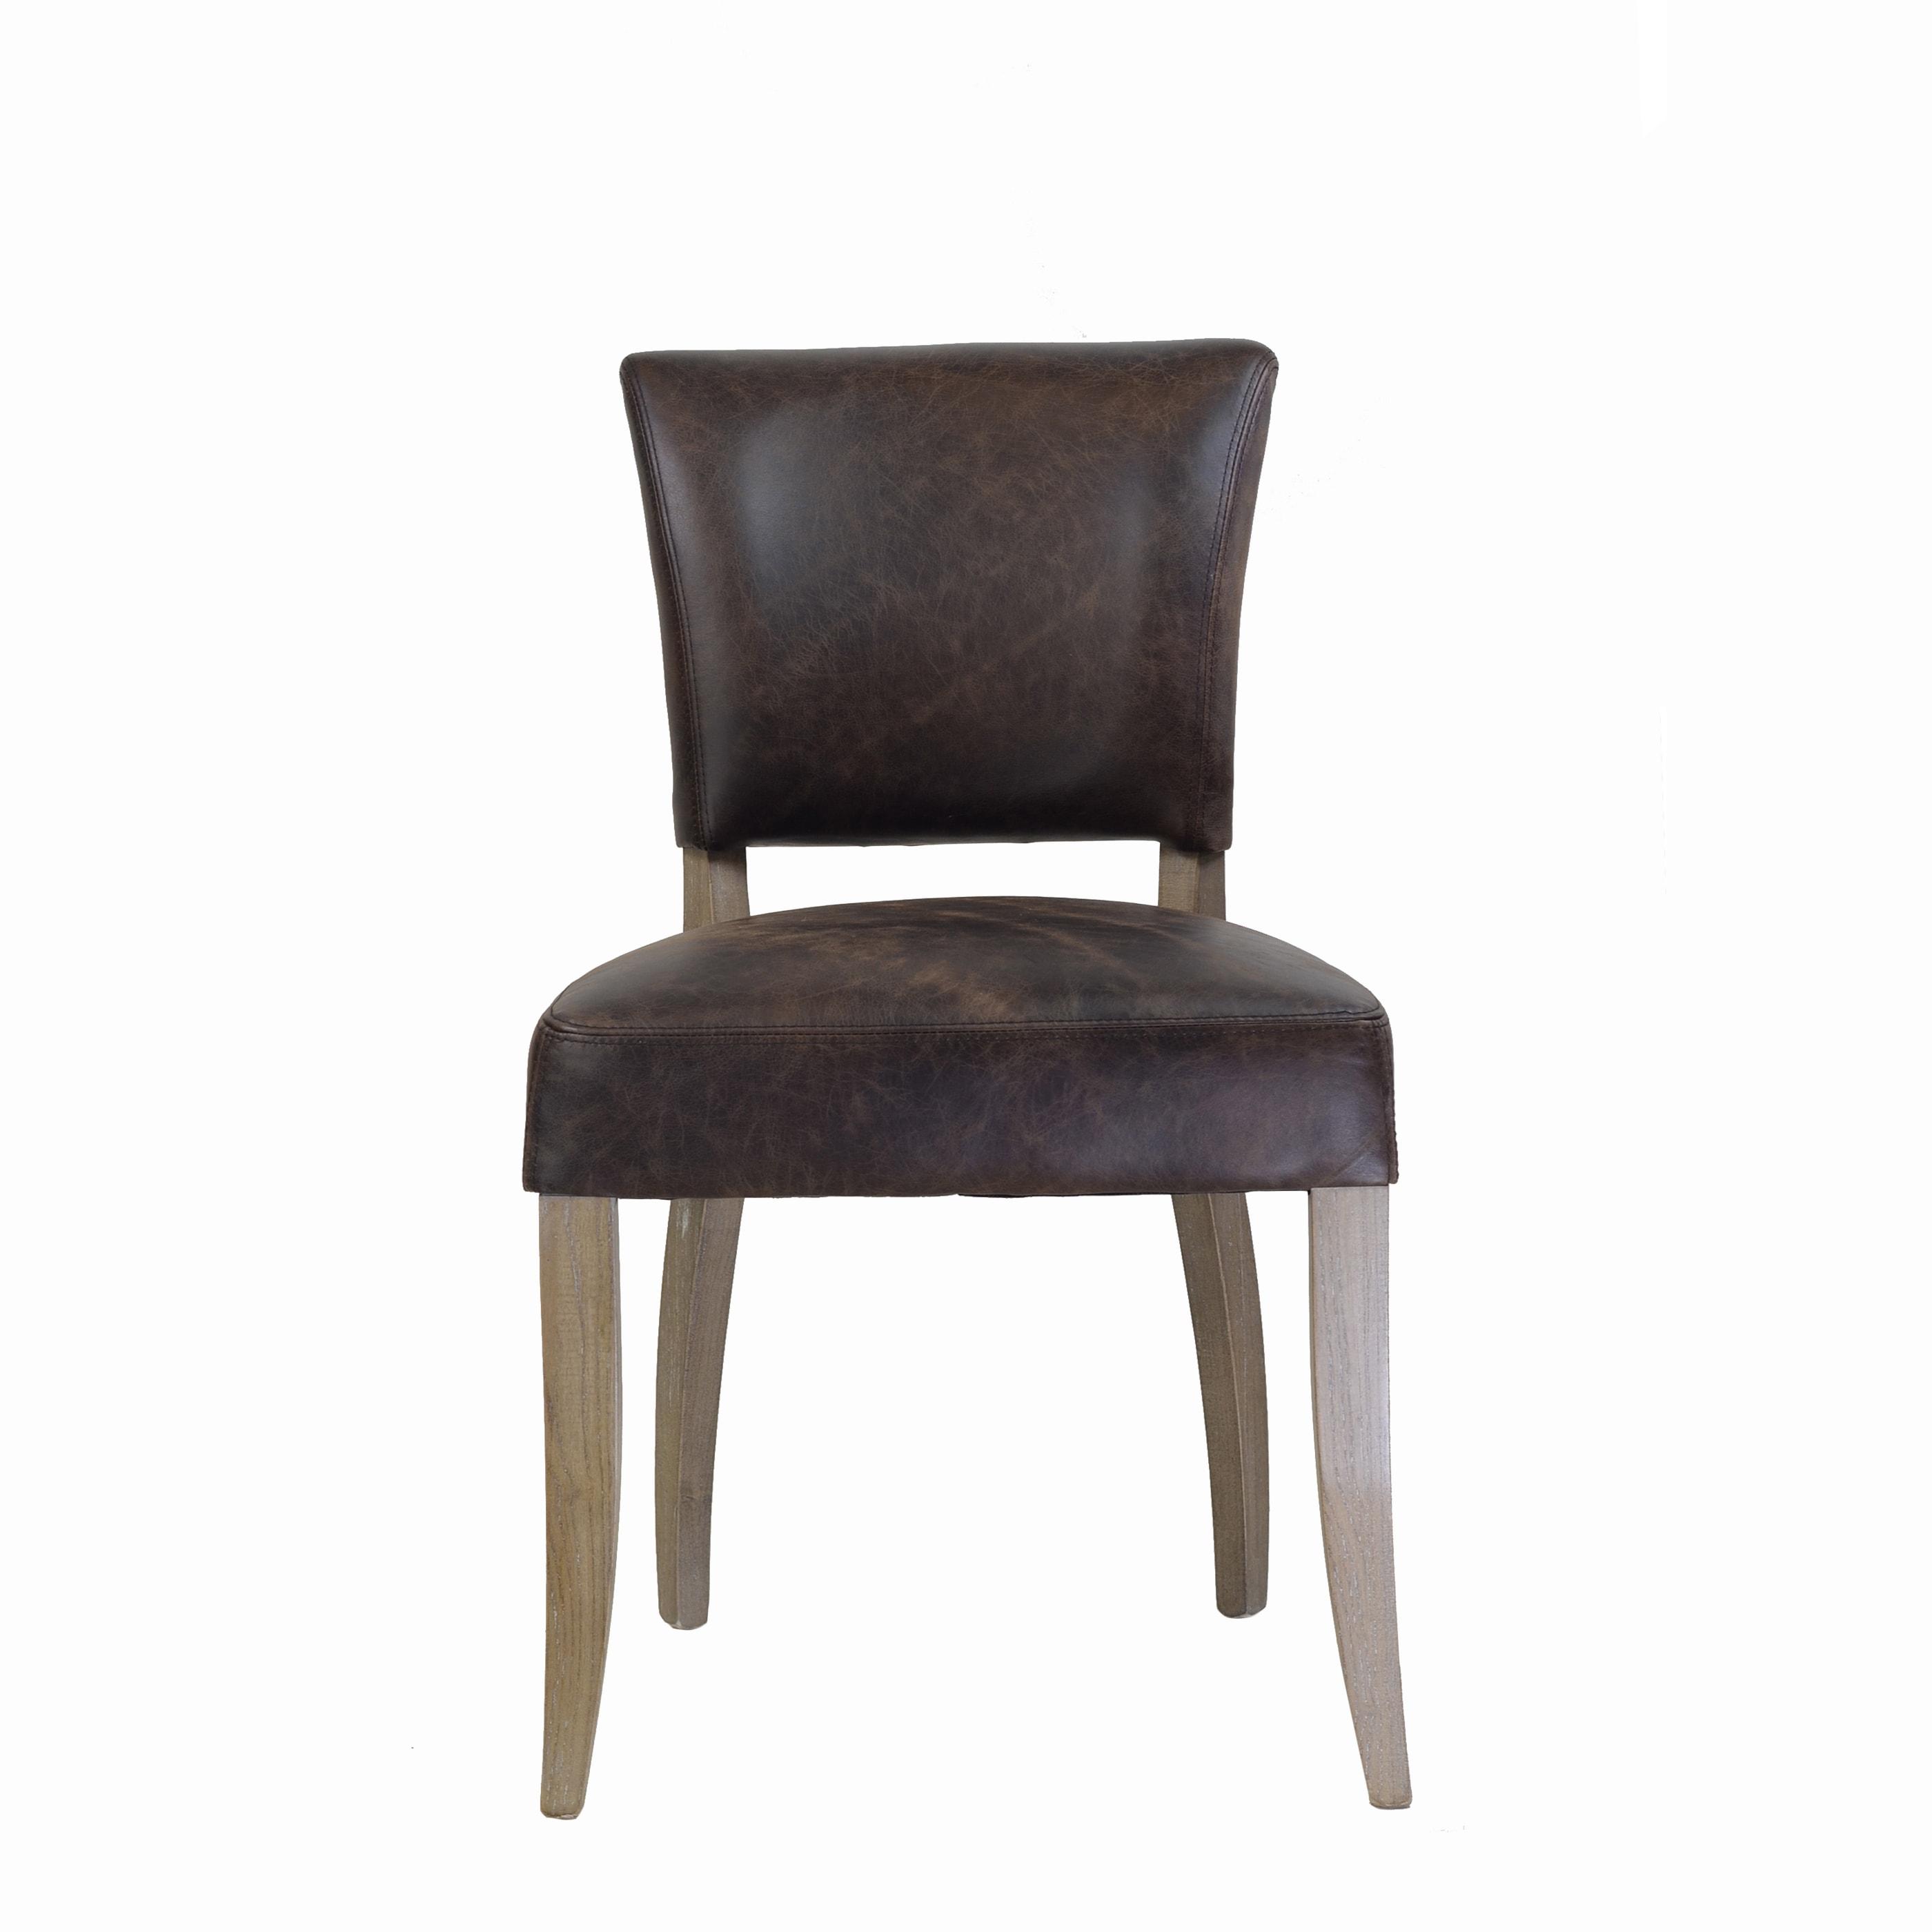 Marvelous Handmade Adele Leather Dining Chair India Machost Co Dining Chair Design Ideas Machostcouk